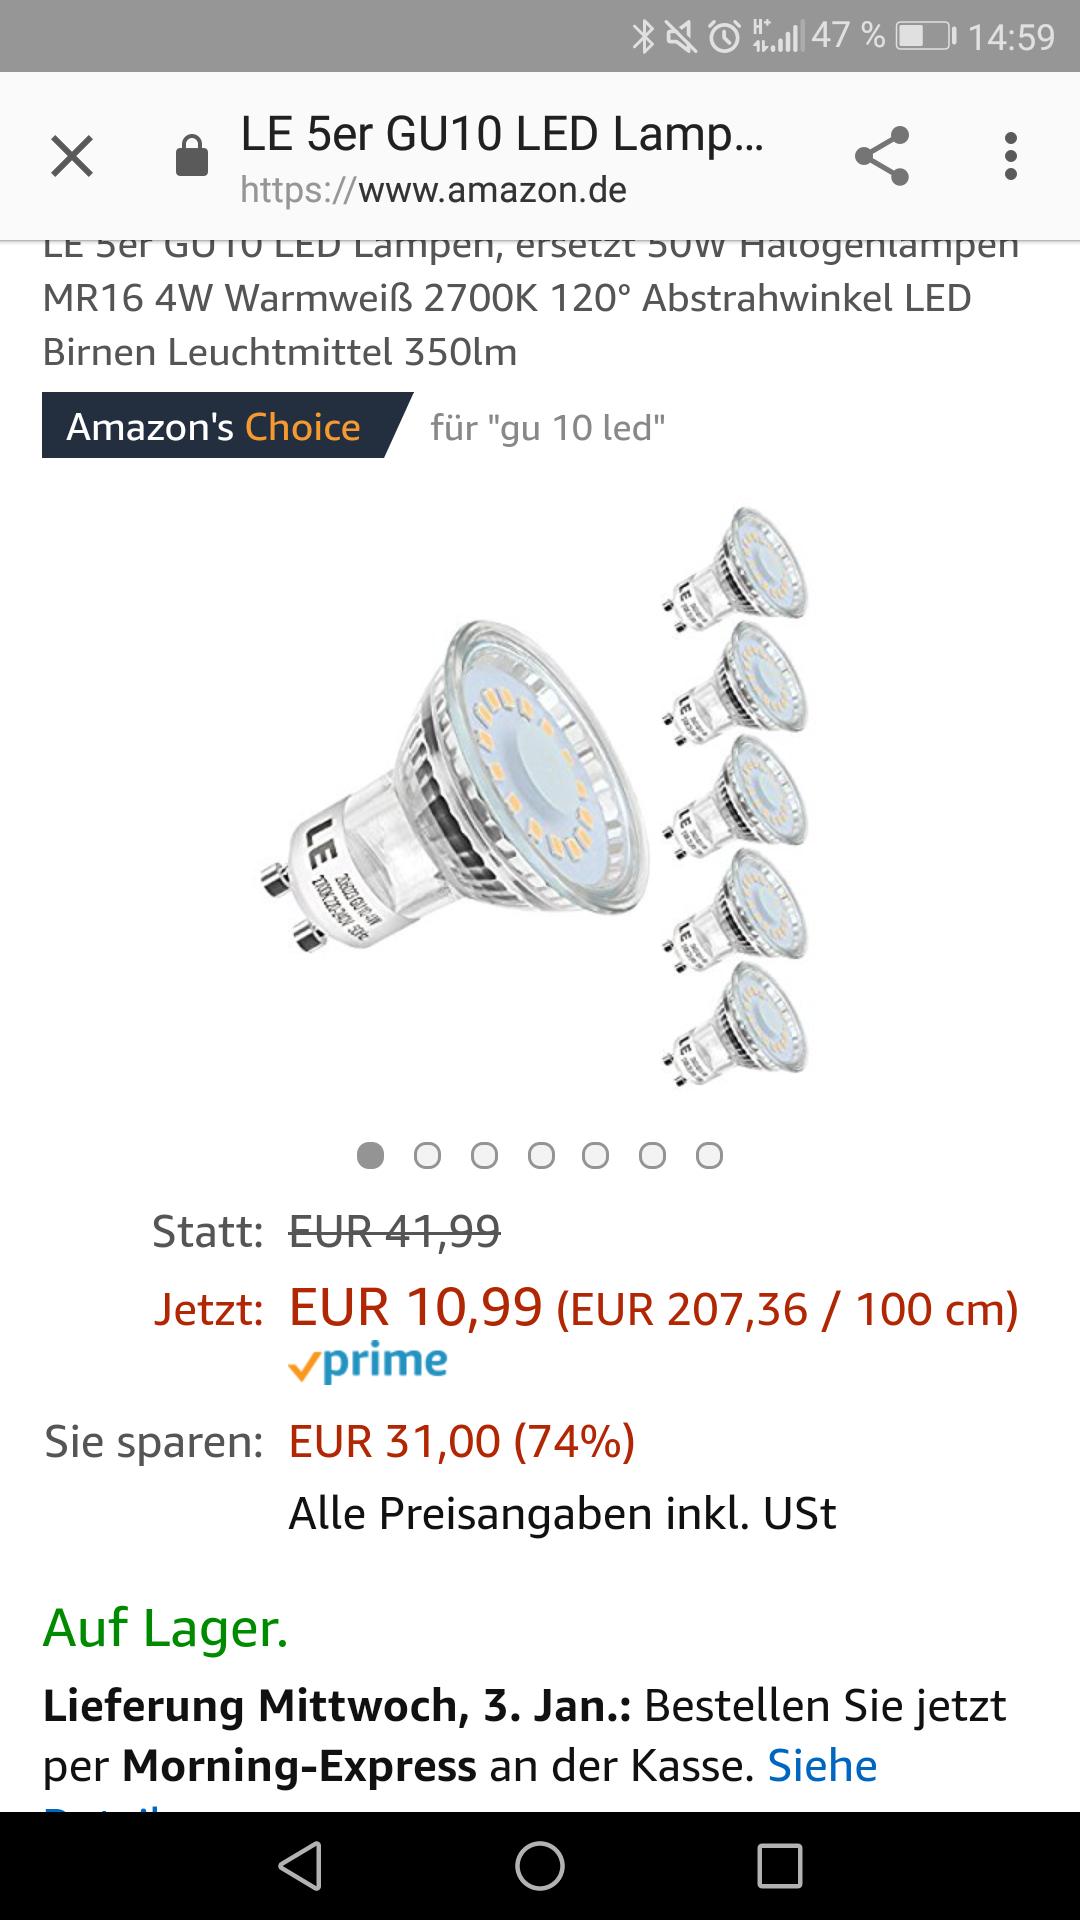 LE 5er GU10 LED Lampen, ersetzt 50W Halogenlampen MR16 4W Warmweiß 2700K